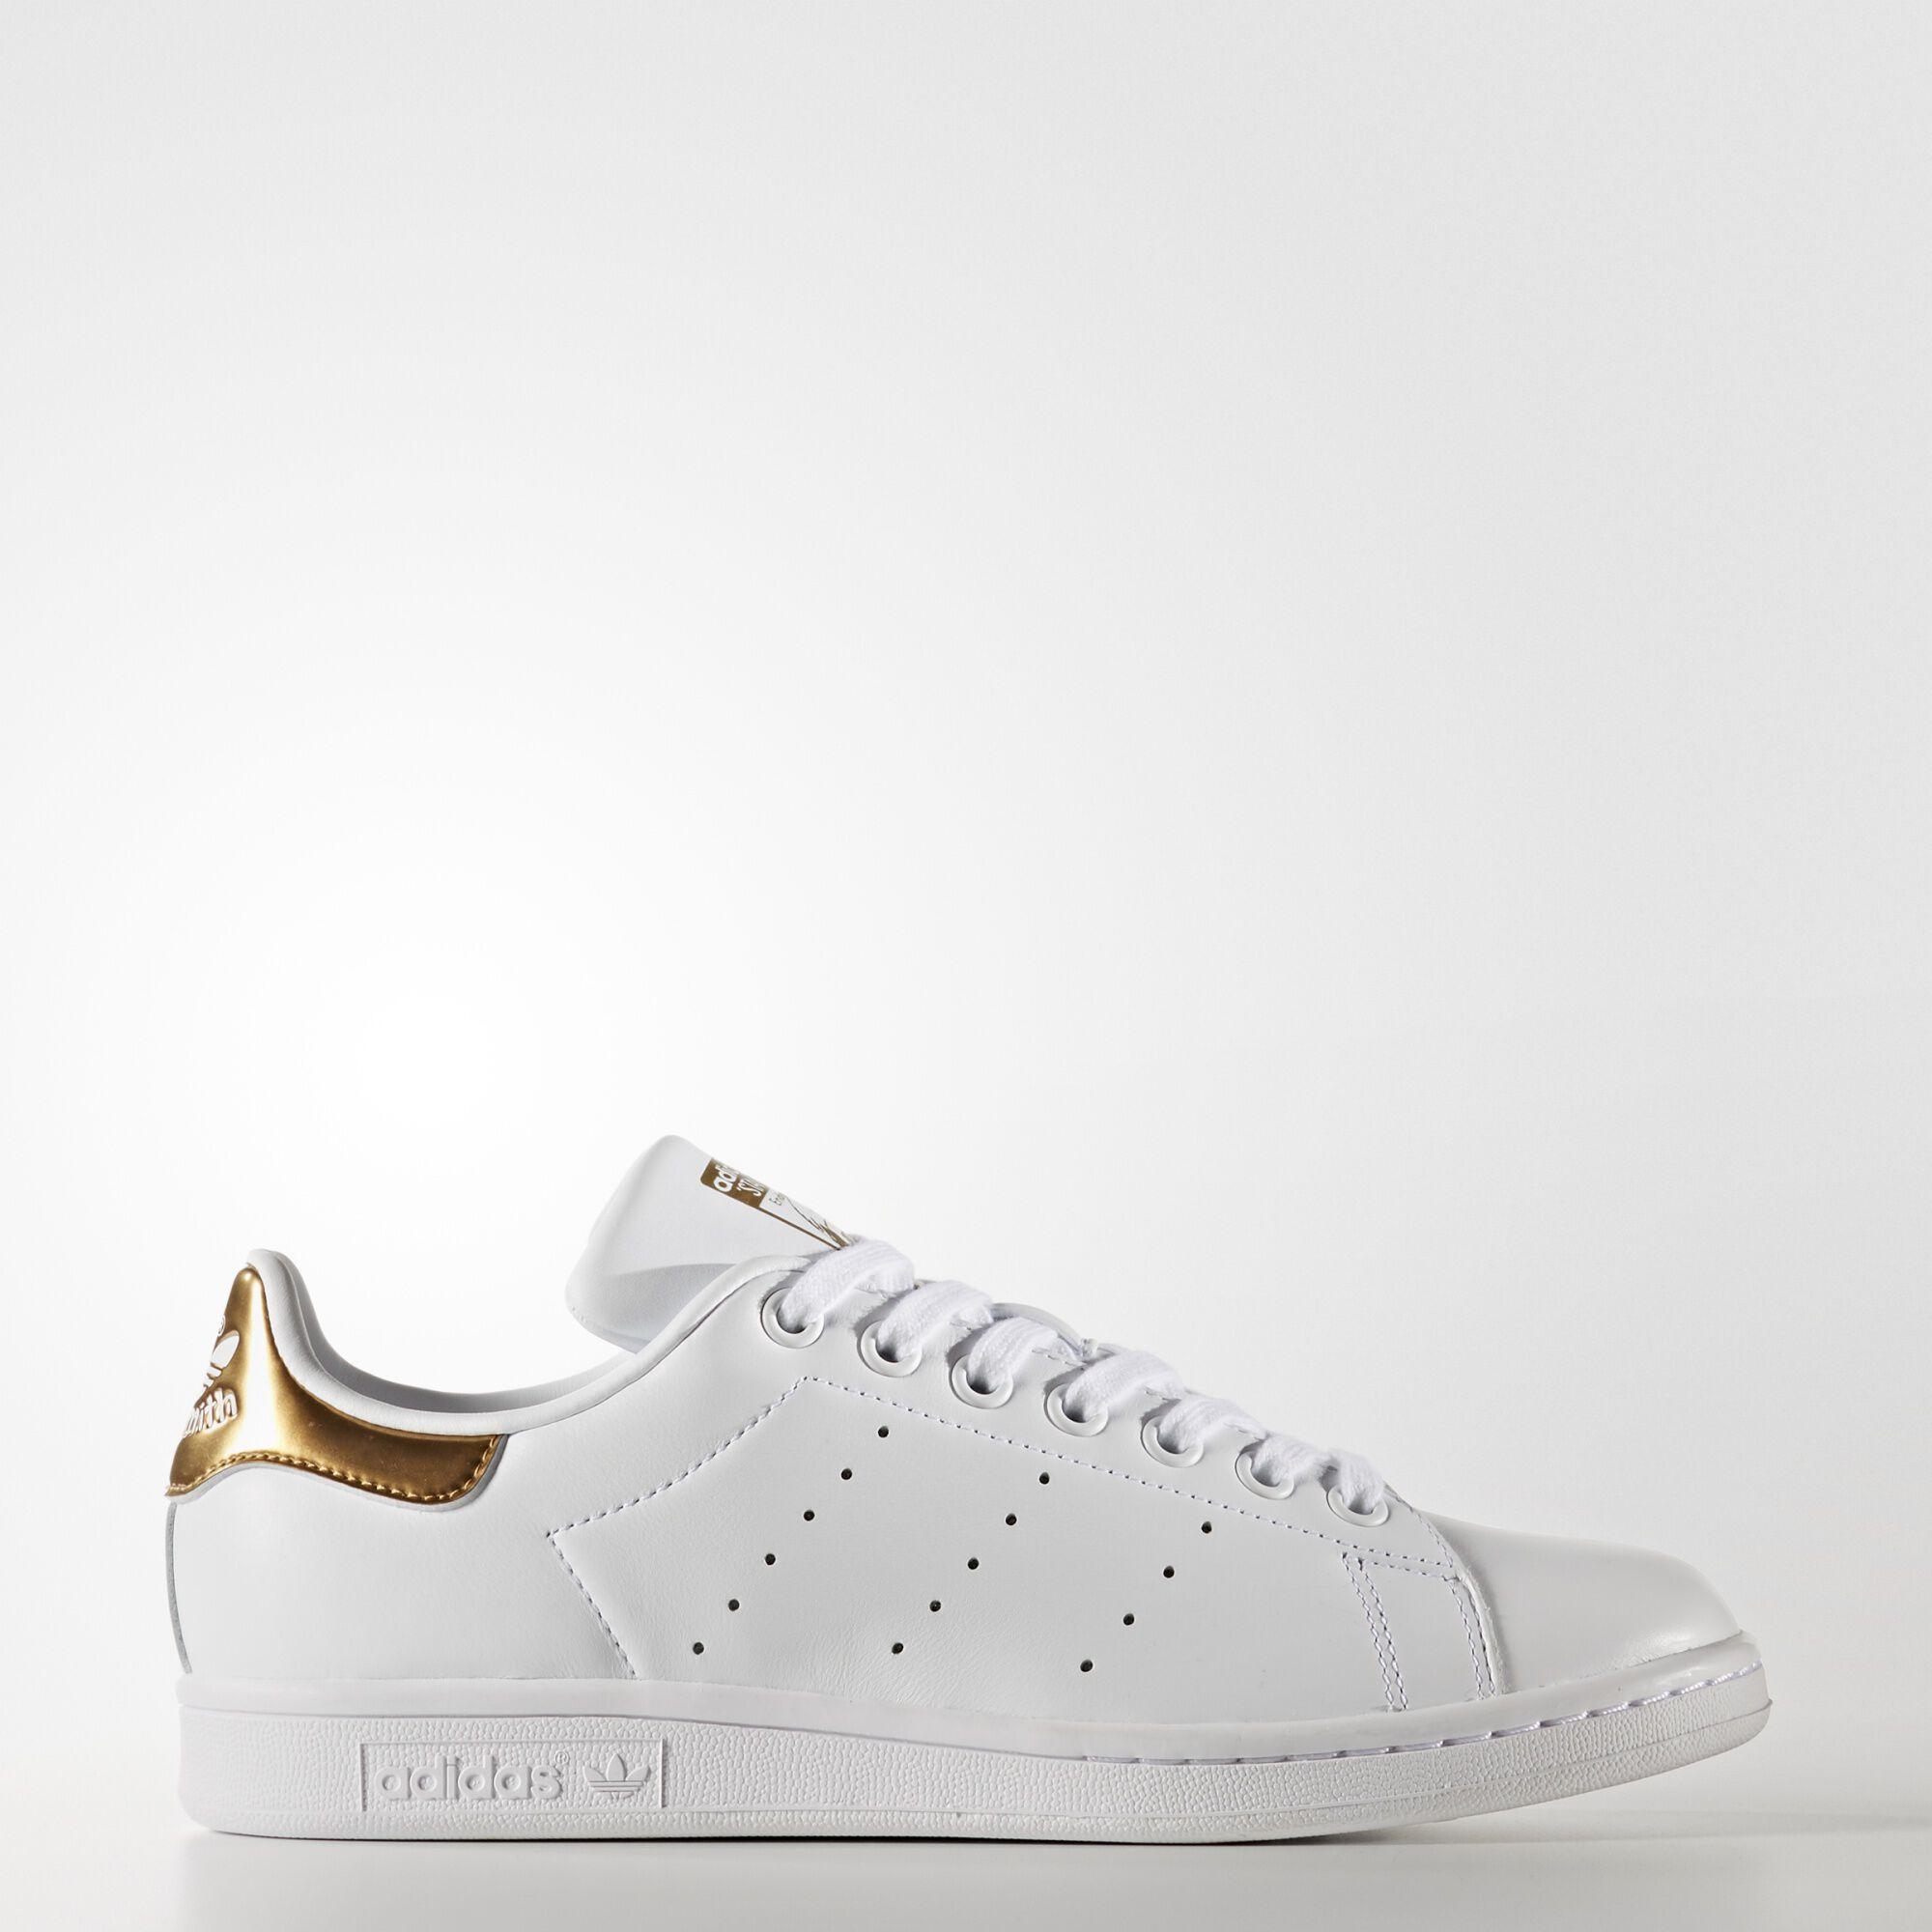 Scarpe da Ginnastica Adidas,Kids Adidas Running Shoes >Off49% Originali Scarpe